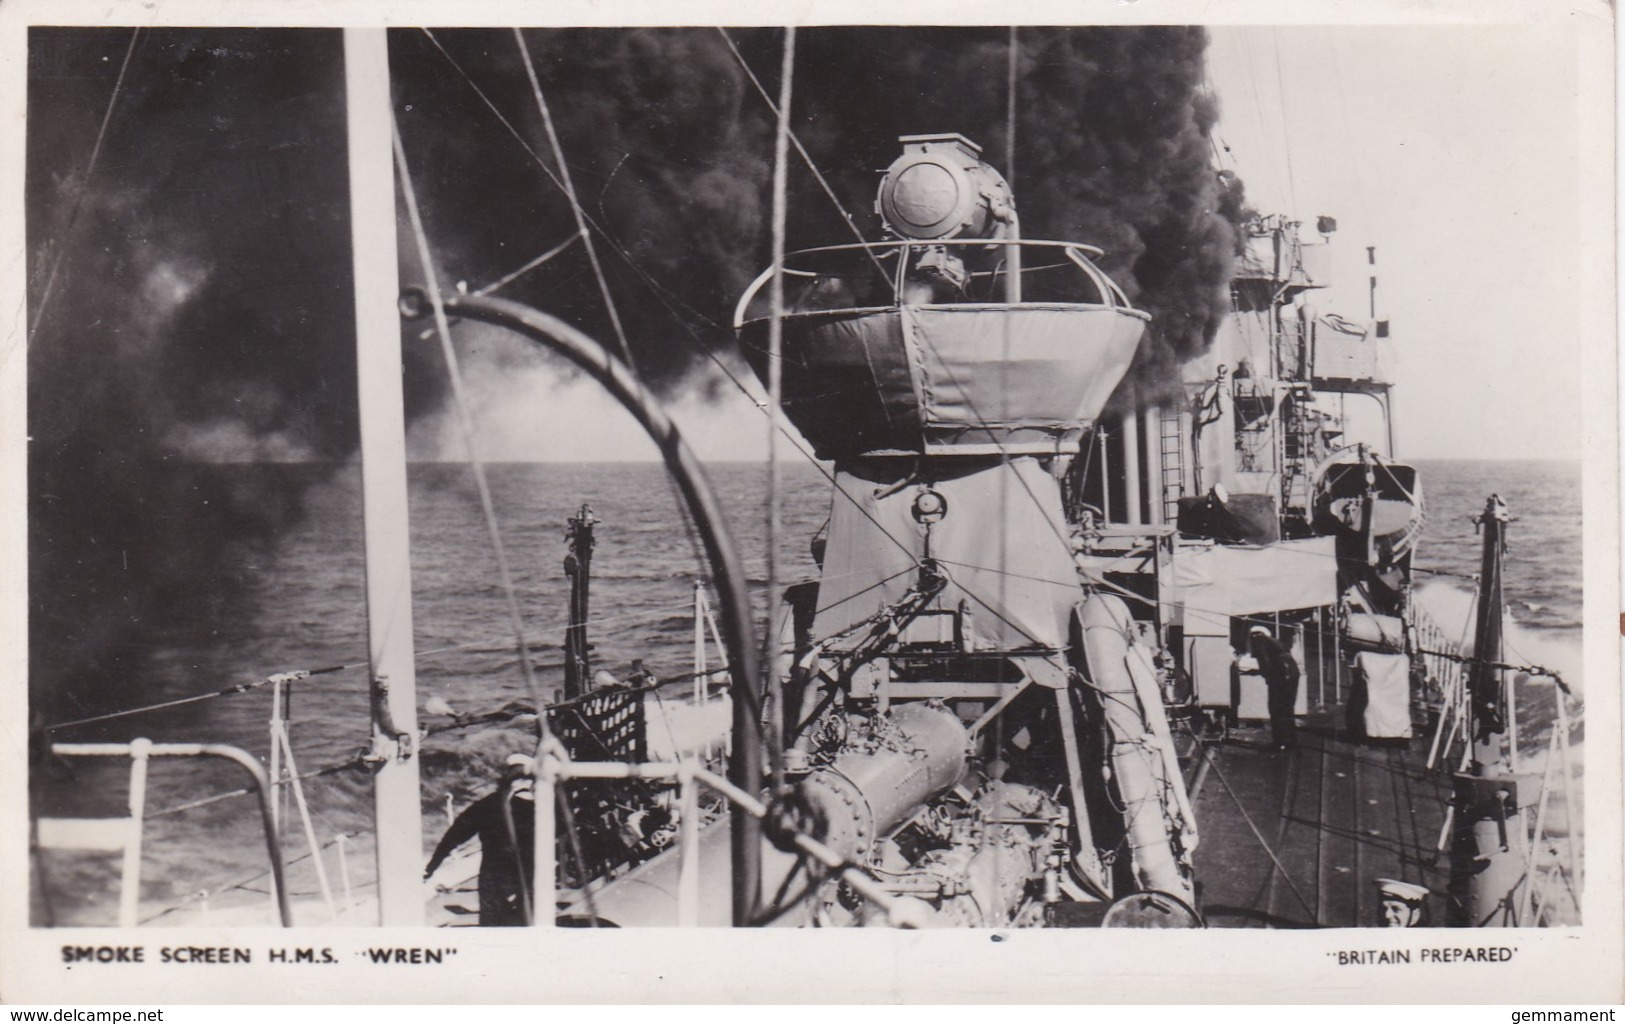 H.M.S. WREN - SMOKE SCREEN. BRITAIN PREPARED SERIES - Warships